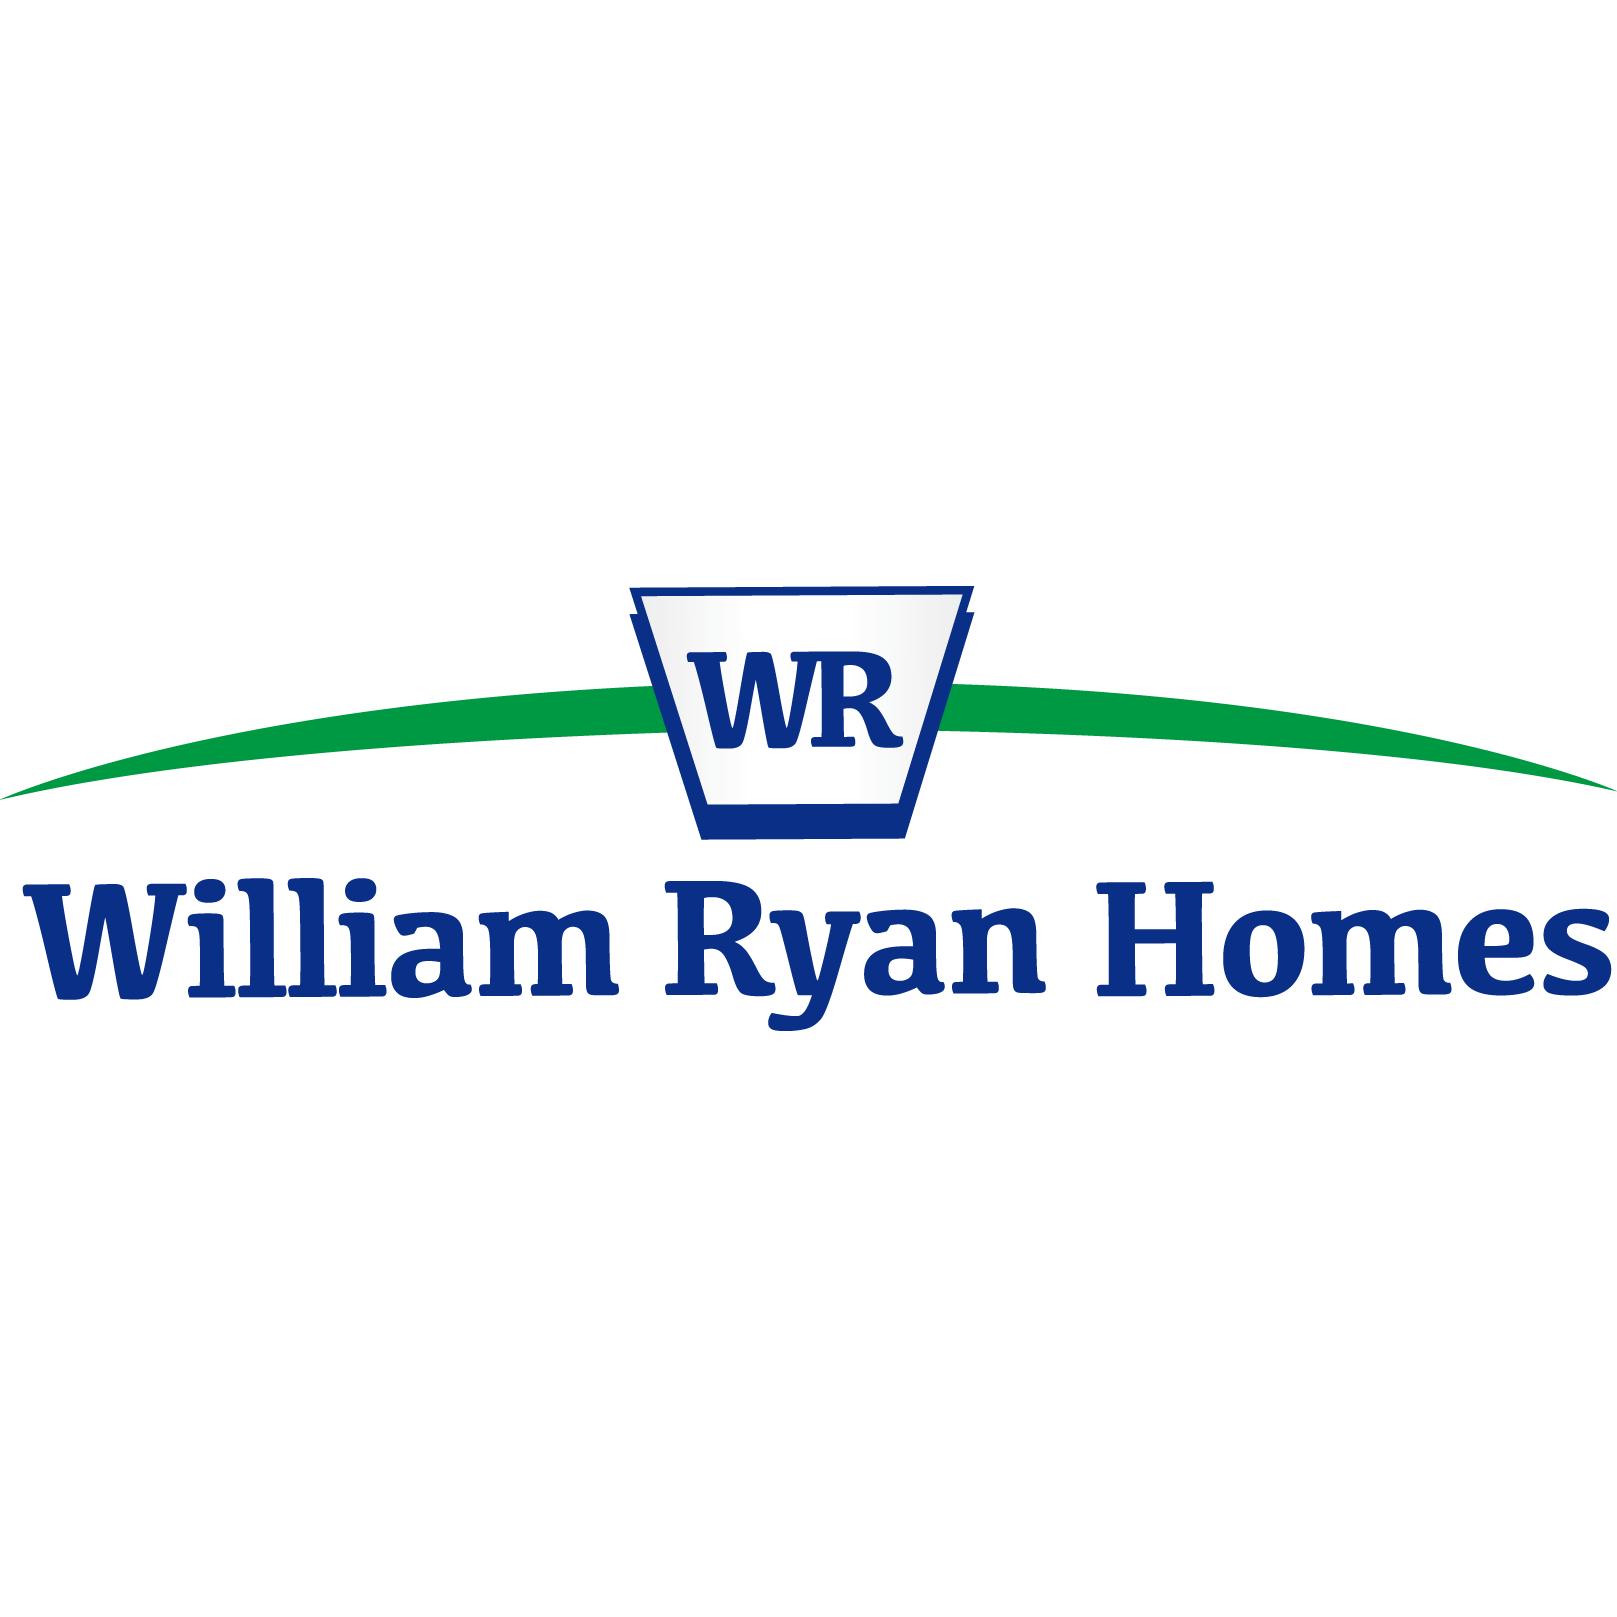 FloraBlu Estates by William Ryan Homes - Seffner, FL 33584 - (813)696-6119 | ShowMeLocal.com